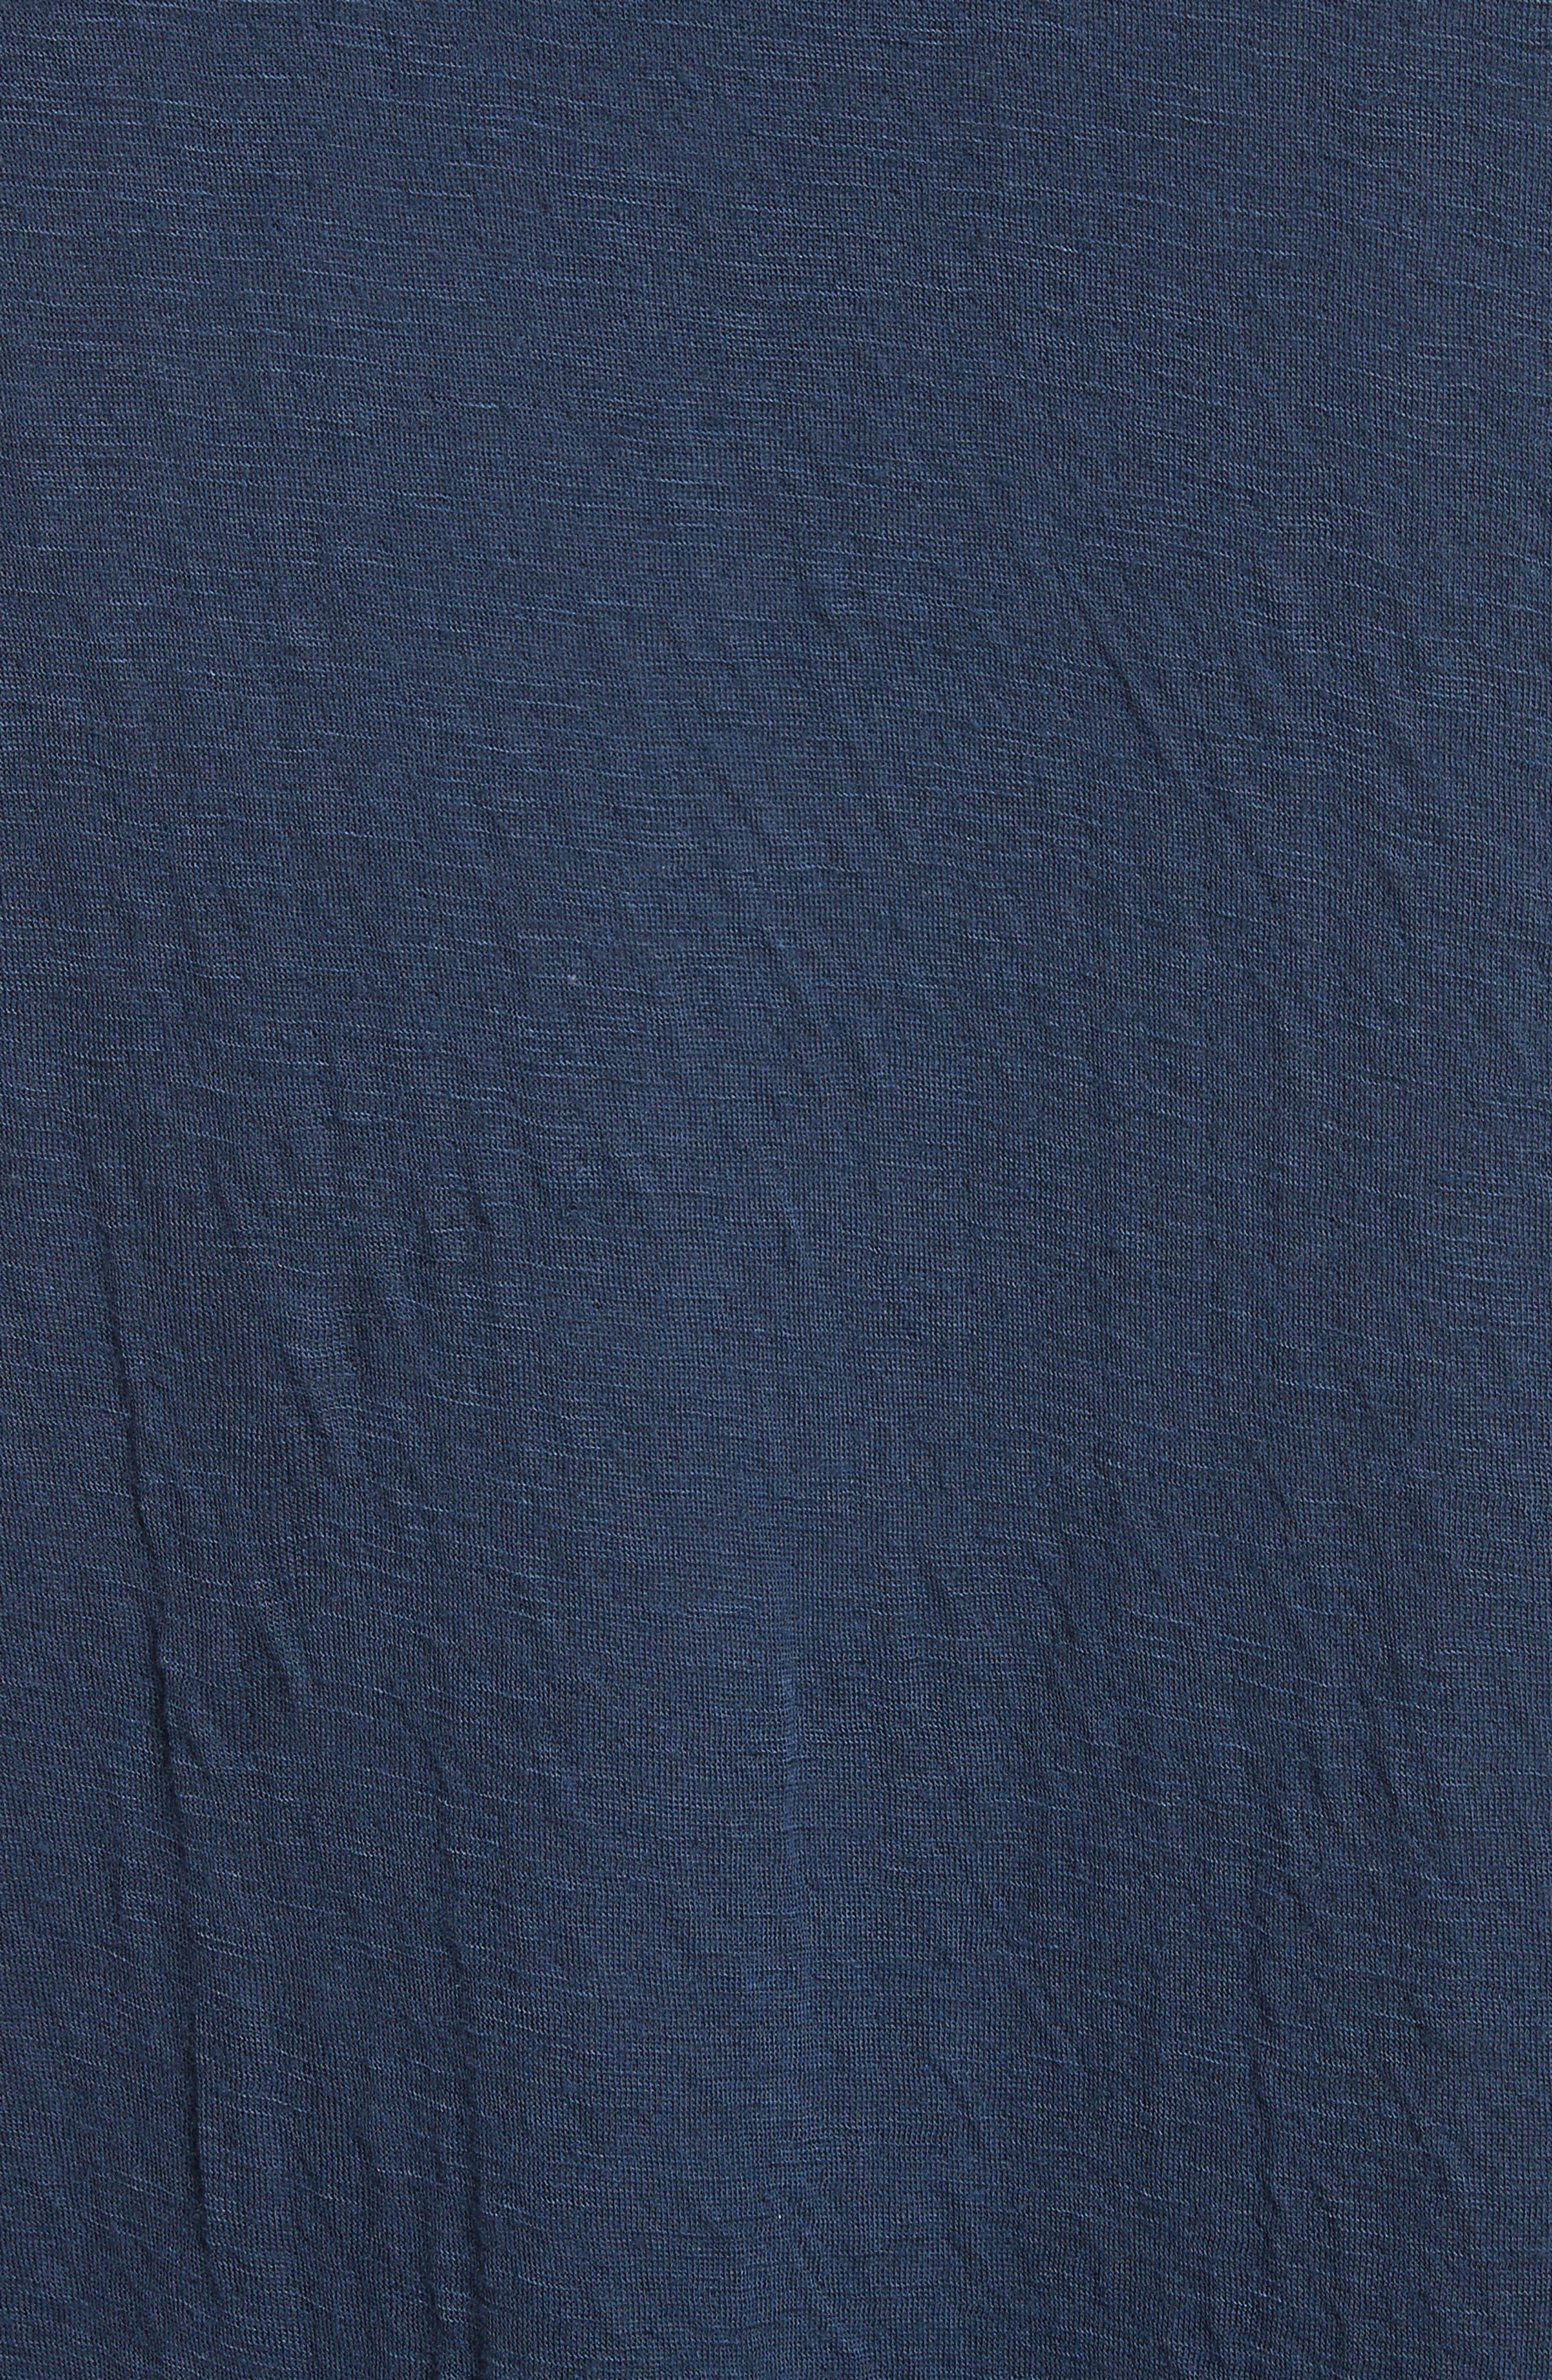 Double Face T-Shirt,                             Alternate thumbnail 5, color,                             Navy